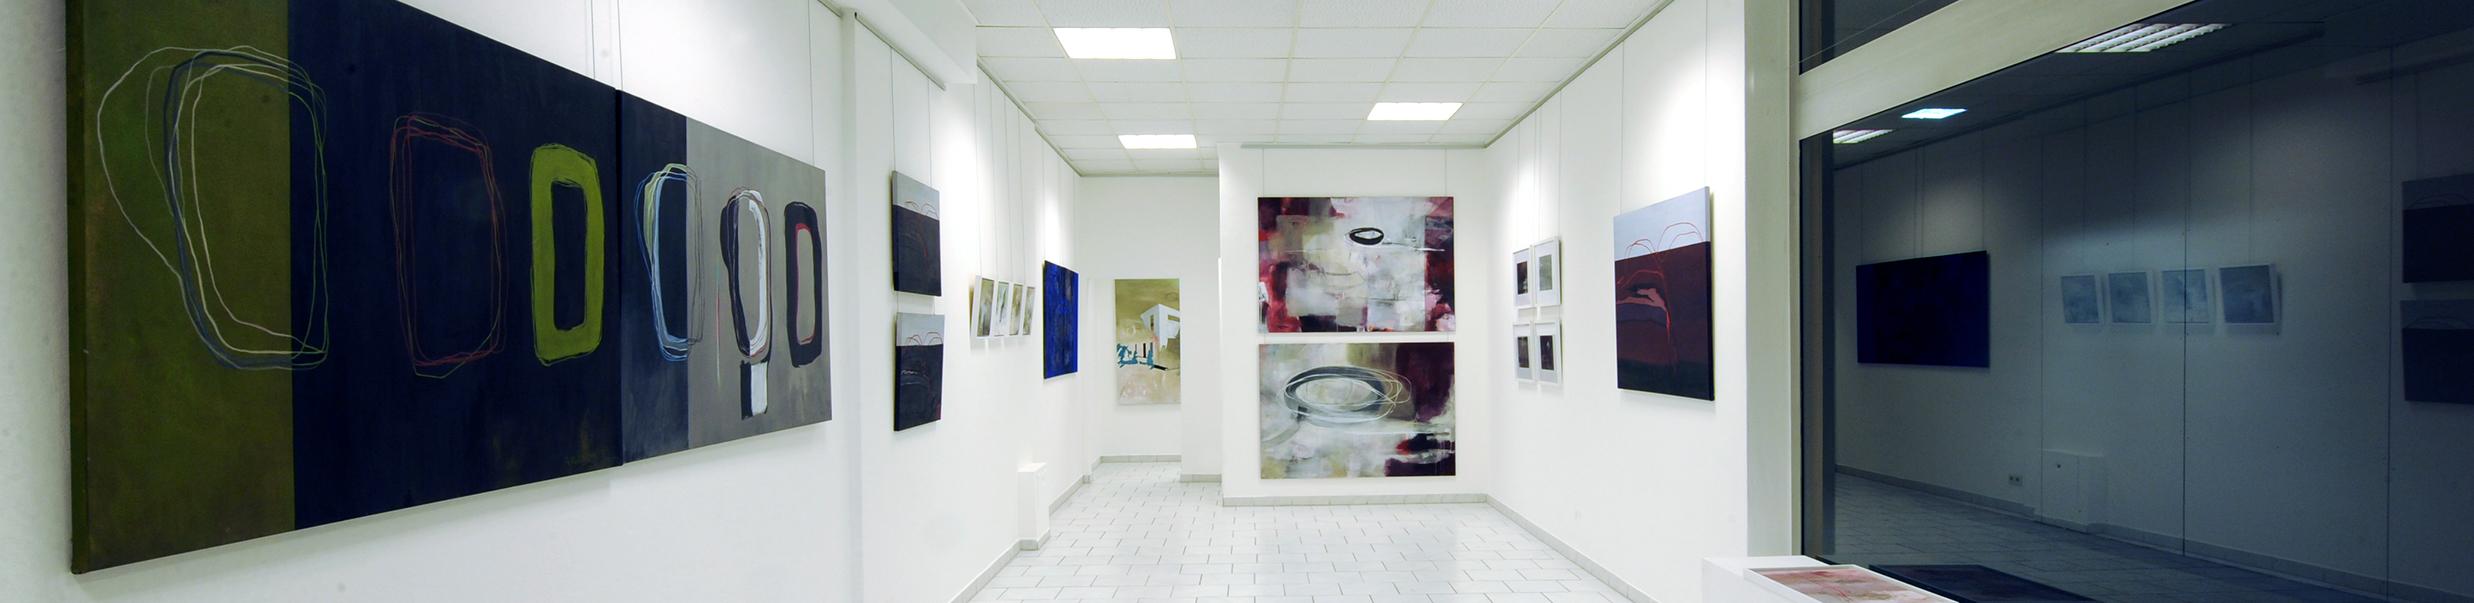 #20045 | Acryl auf Leinwand | 50 x 65 cm